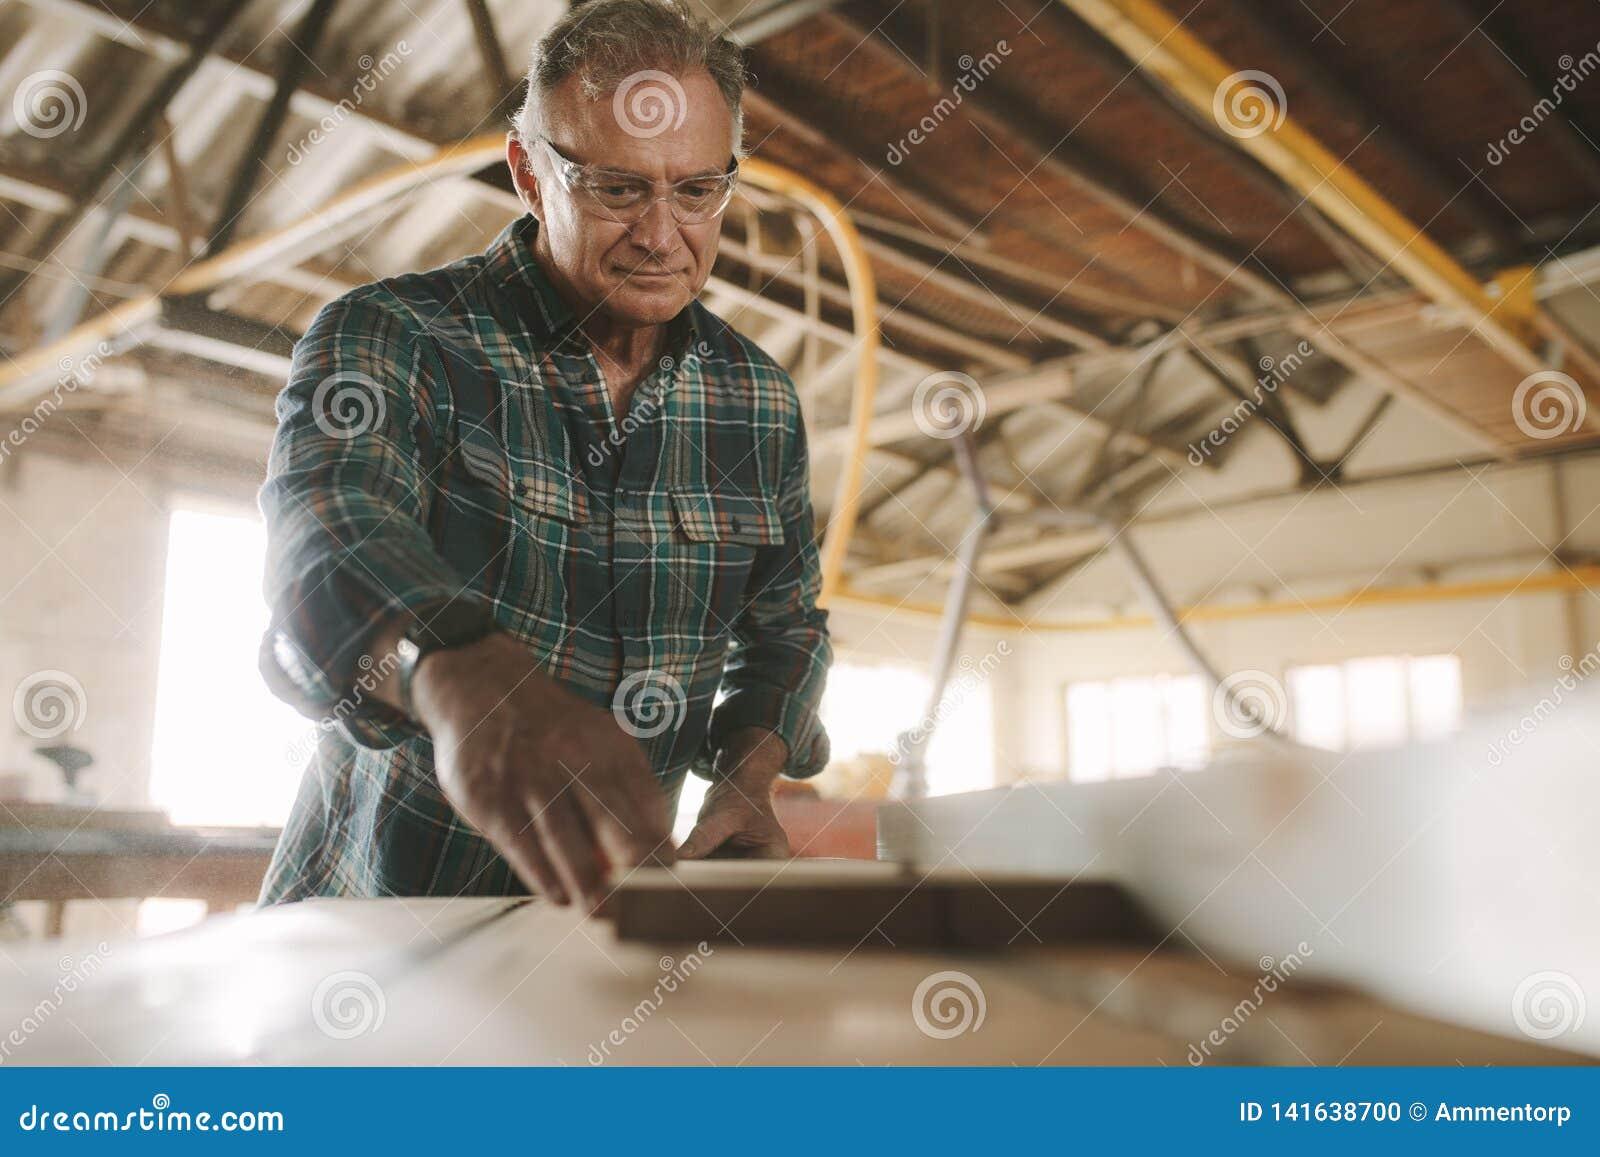 Carpinteiro que corta as pranchas de madeira na serra elétrica